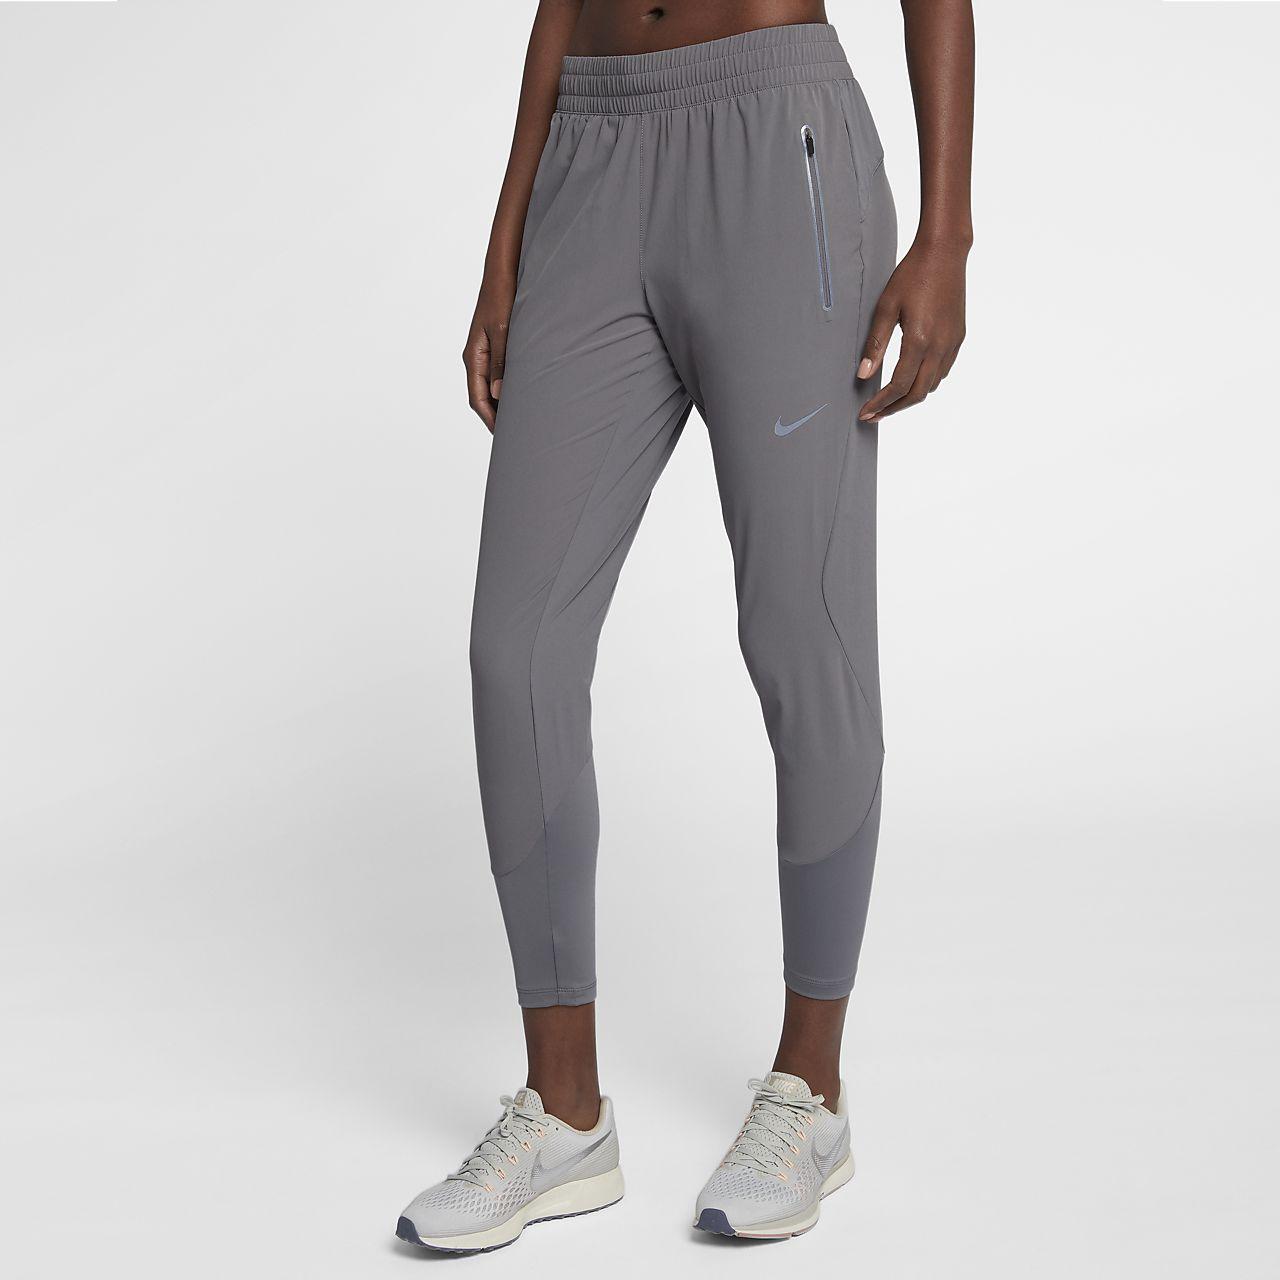 Running Trousers Nike Swift Women's 27\